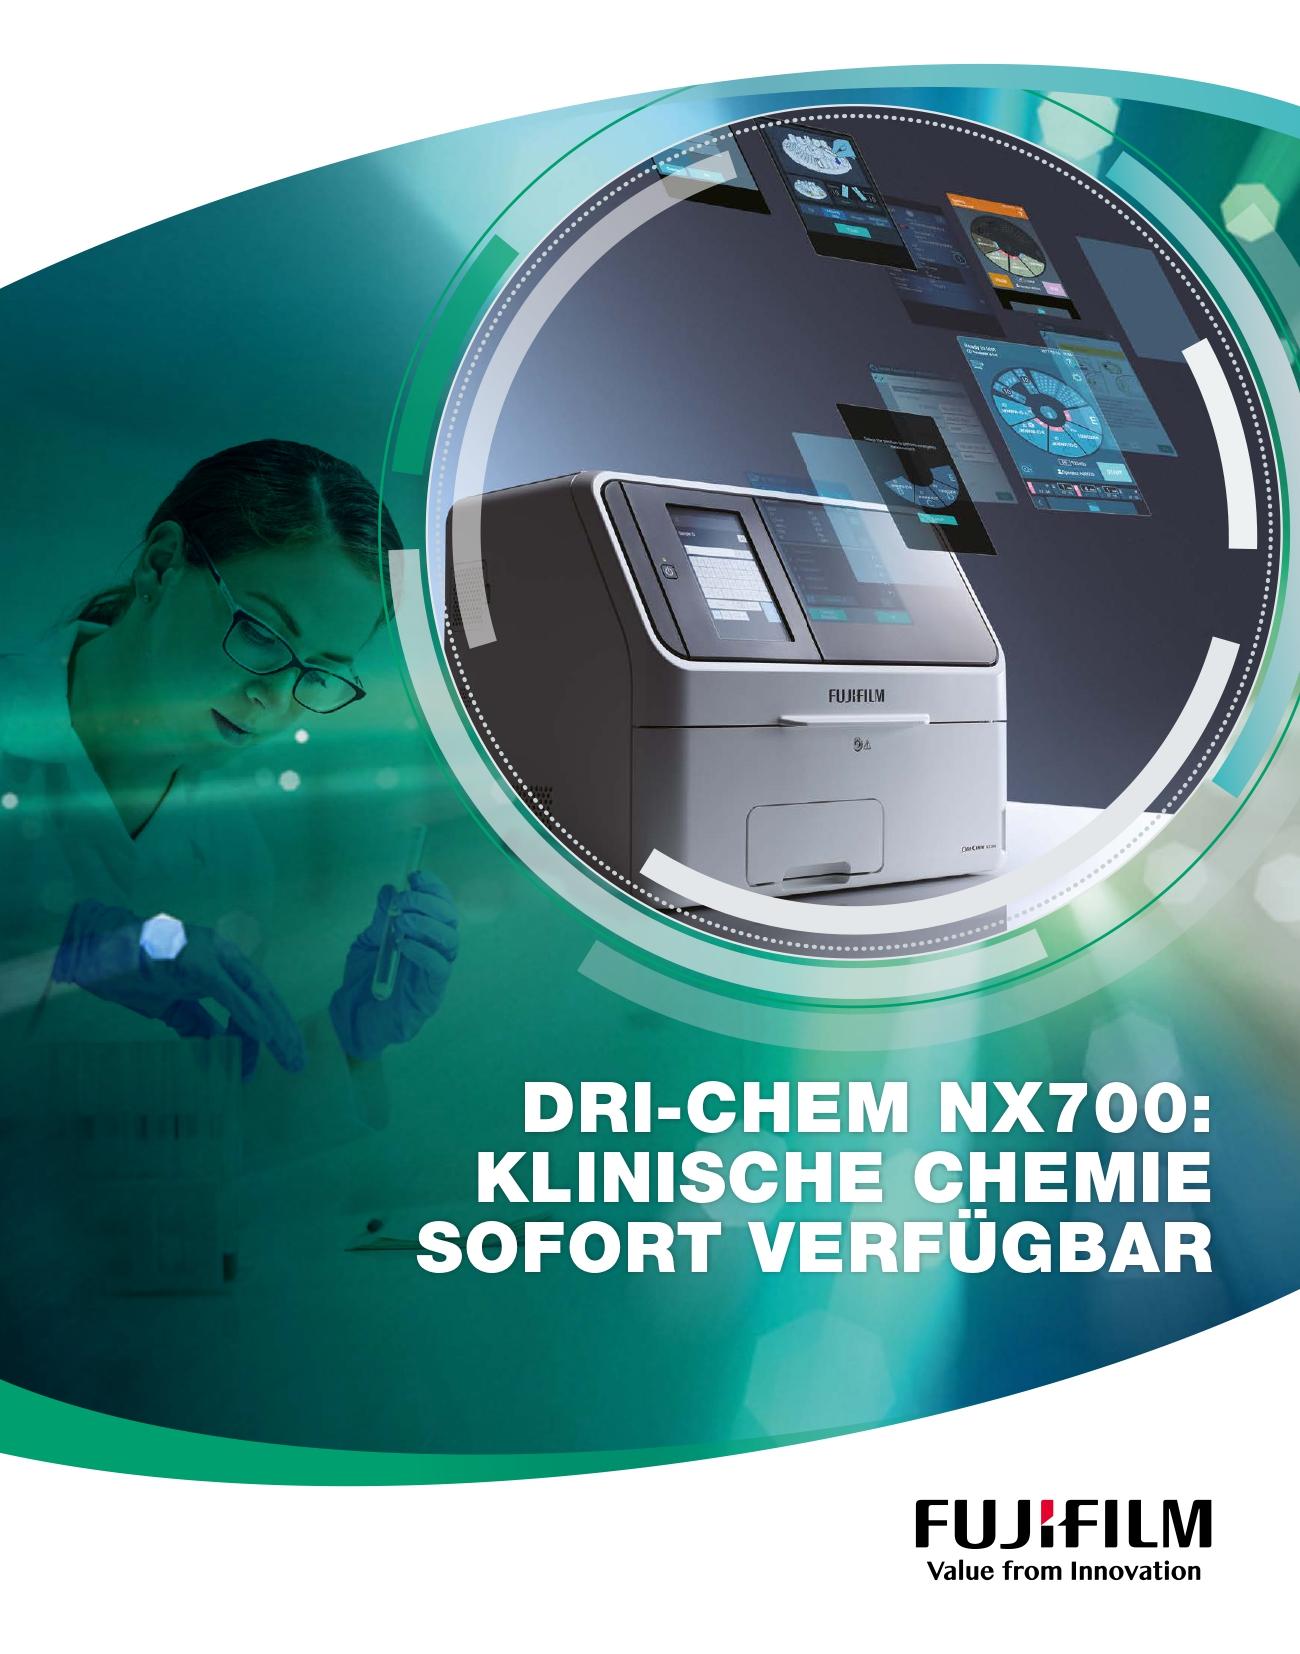 [Foto] FUJIFILM DRI-CHEM NX700 Cover Broschüre